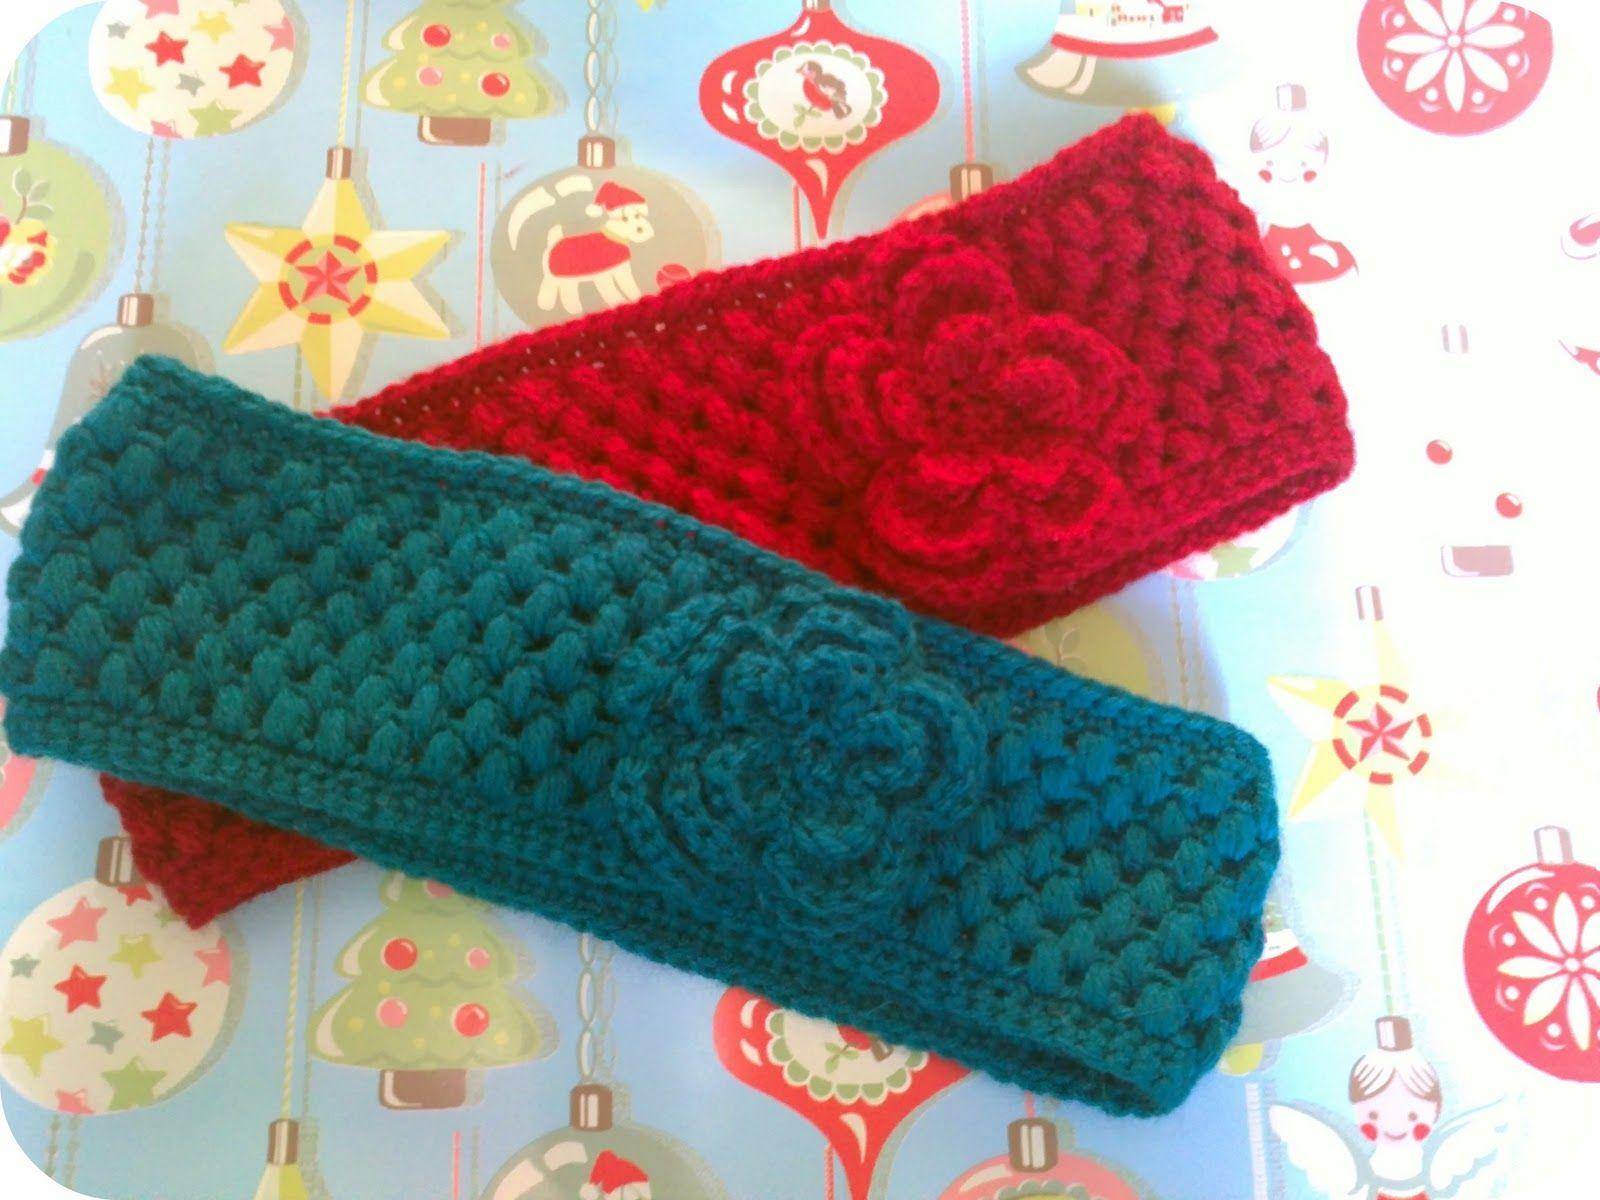 Two Girls Being Crafty: Crocheted ear warmer with flower | Crochet ...